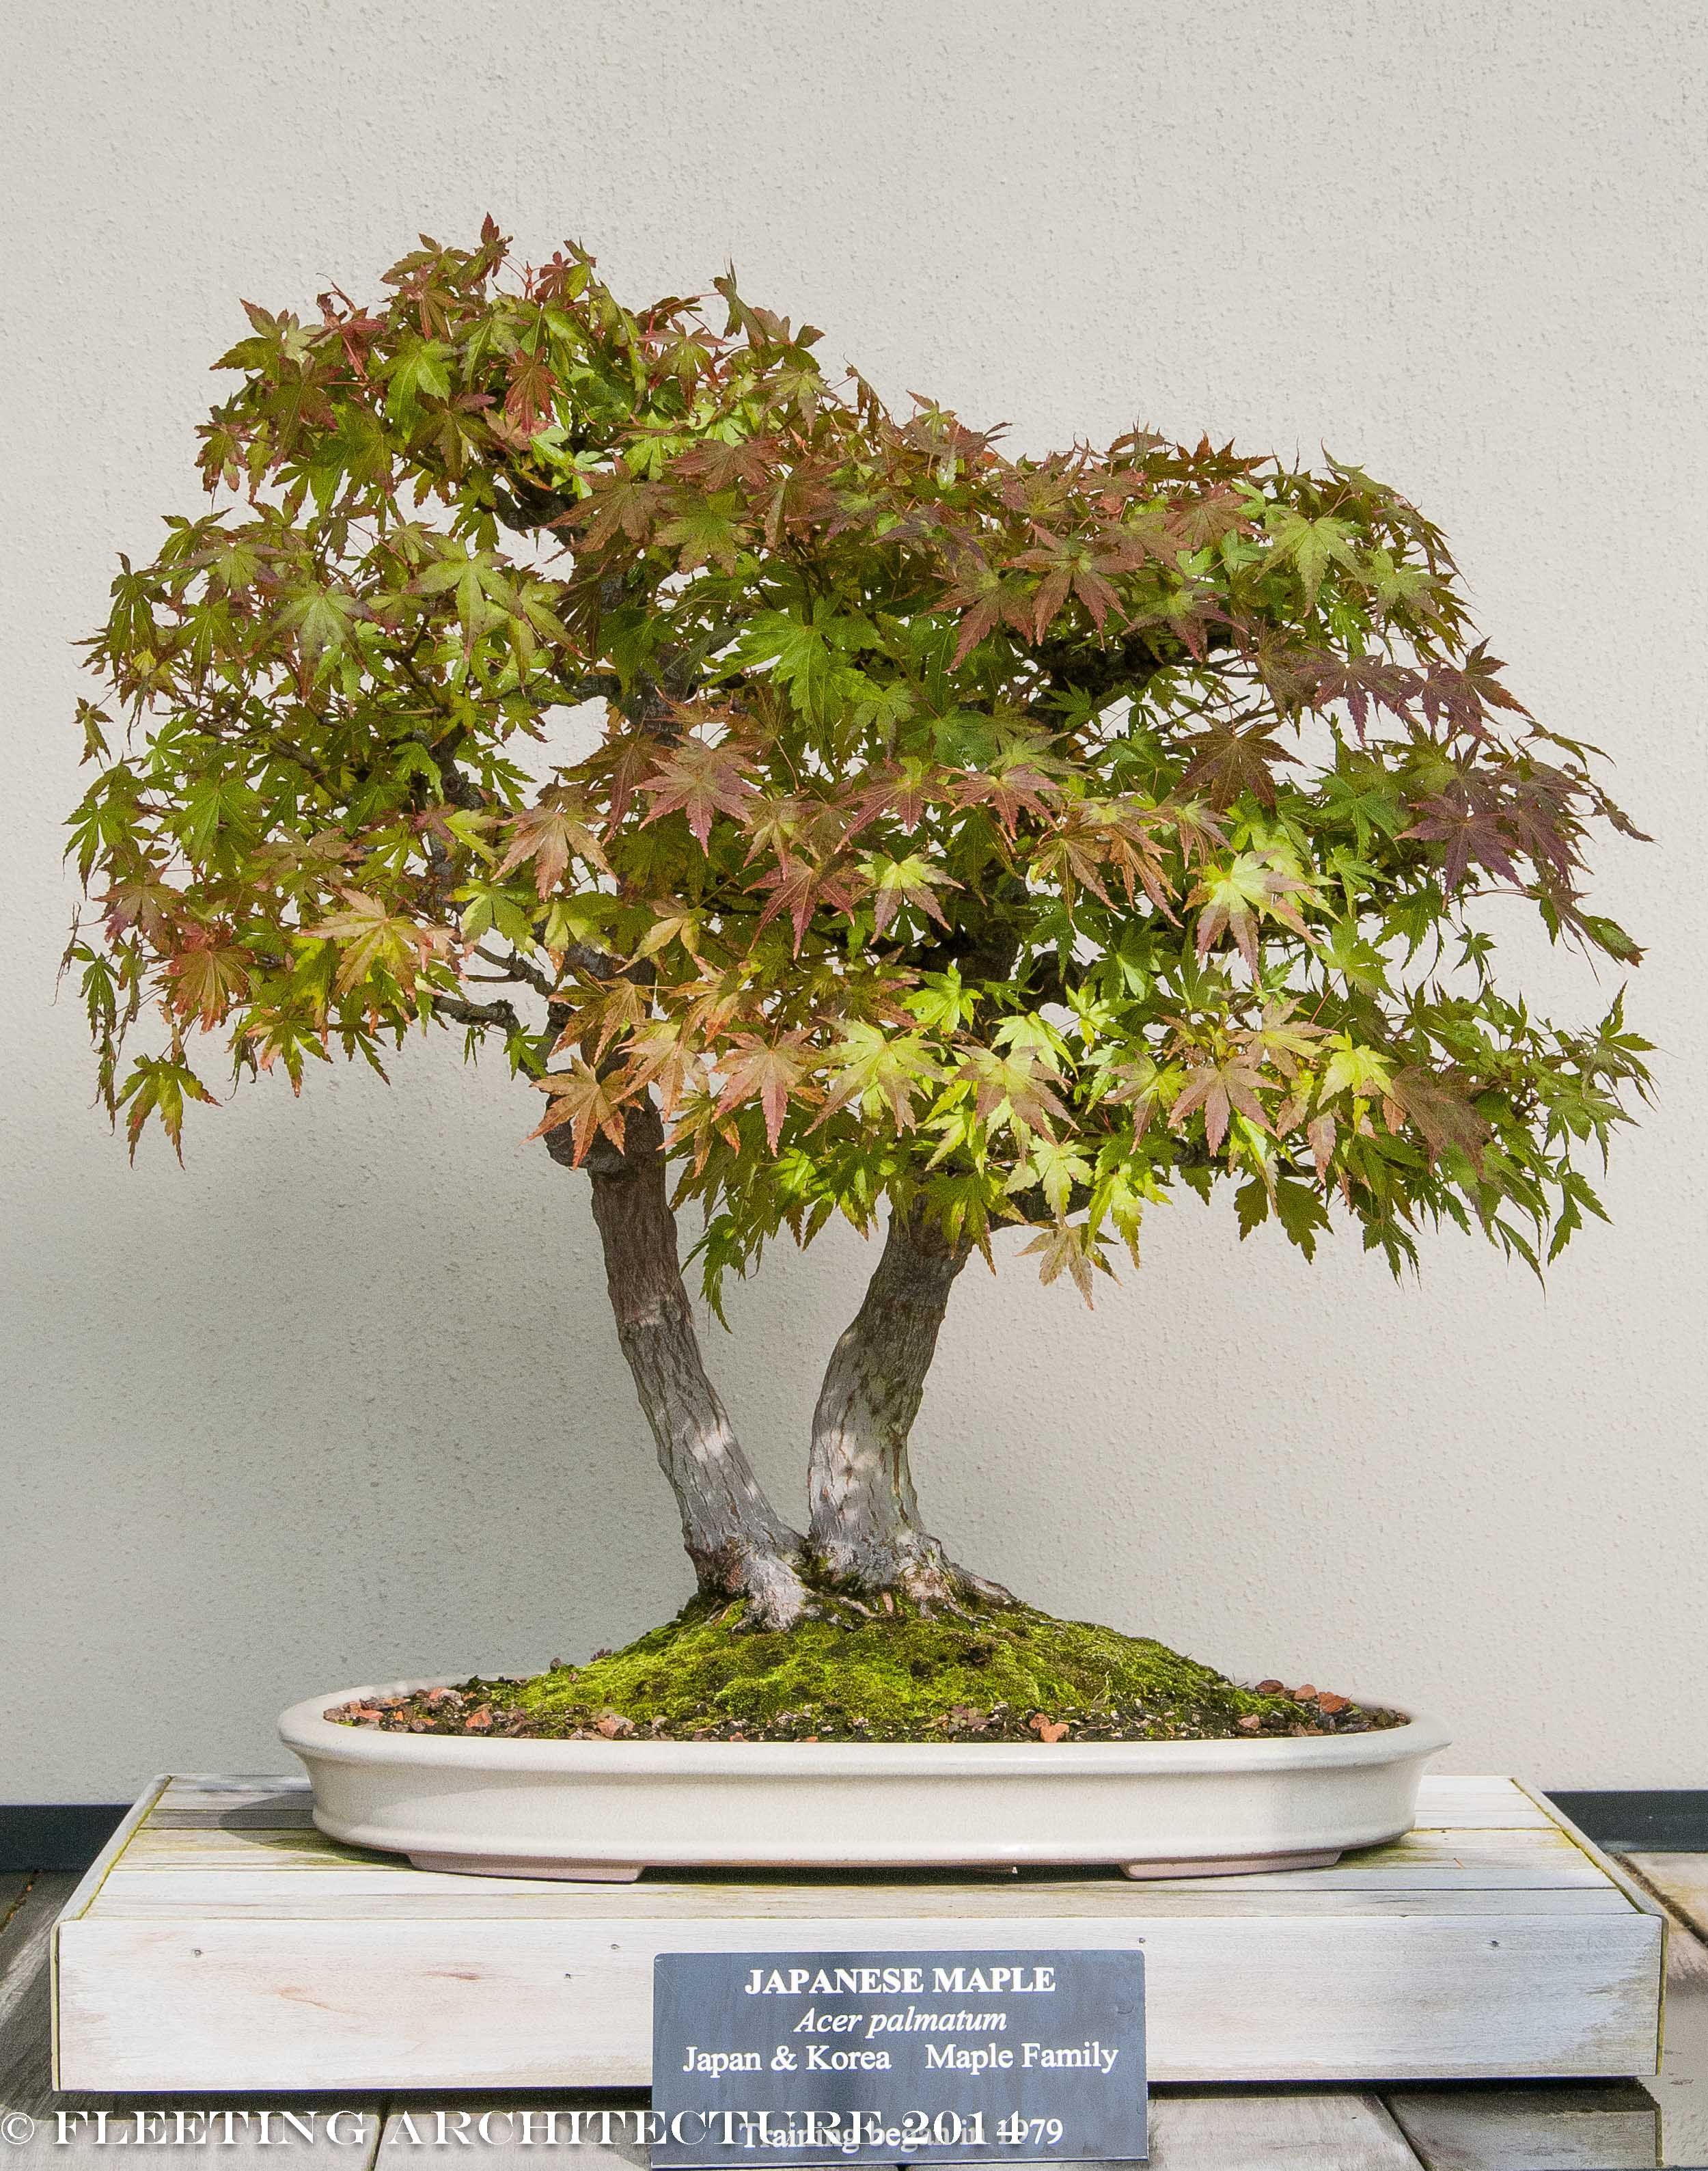 longwood bonsai blog 16 photos for our bonsai lovers bonsai shohin bonsai penjing pinterest. Black Bedroom Furniture Sets. Home Design Ideas